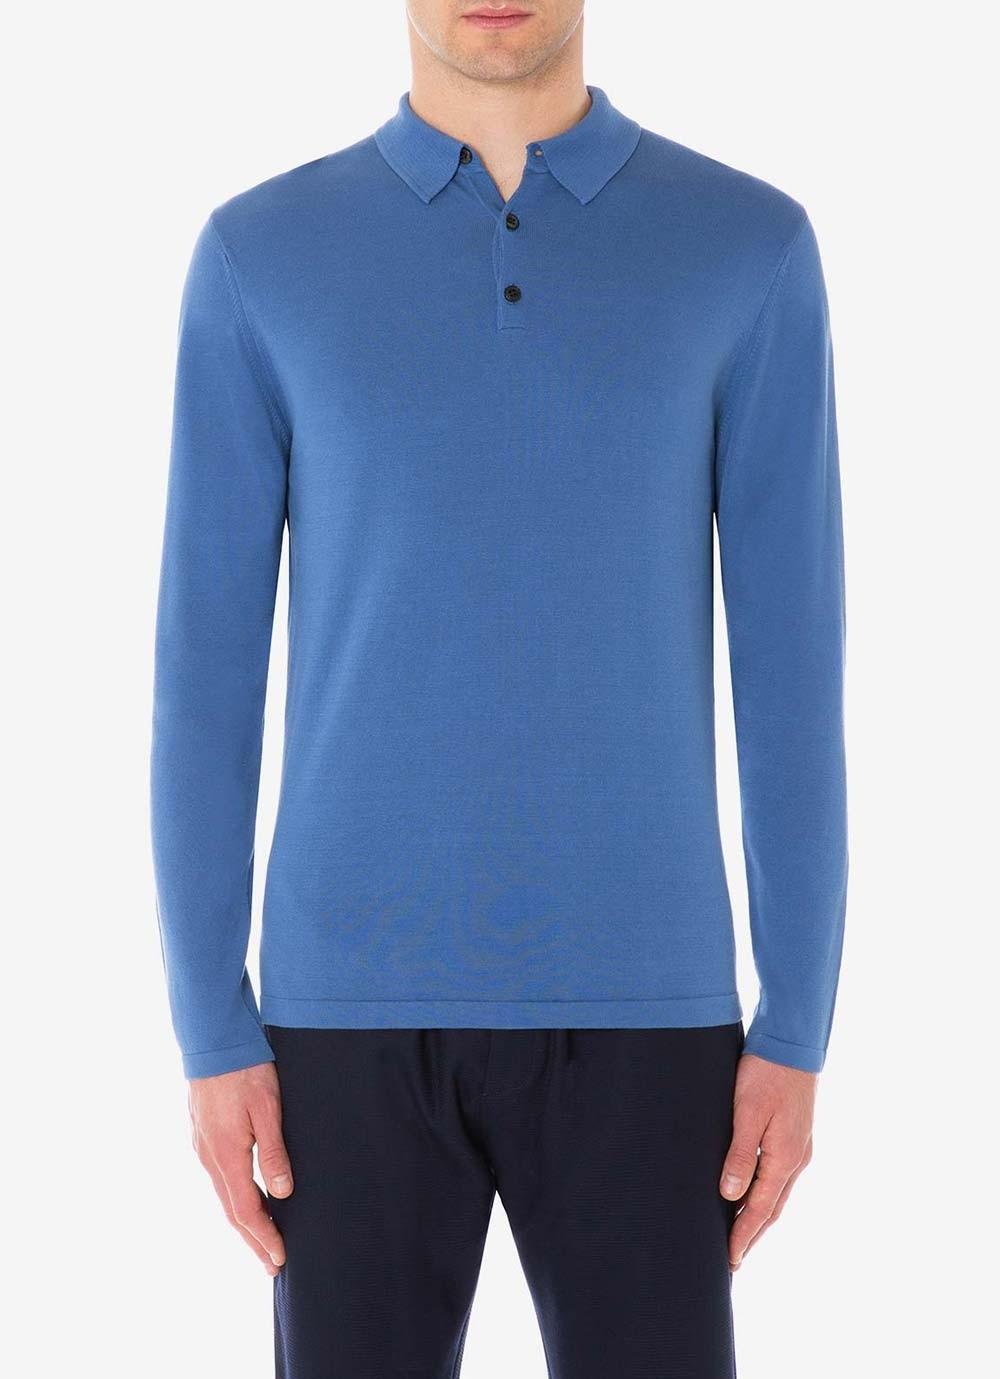 1f205a6f Sunspel - Blue Men's Sea Island Cotton Knit Long Sleeve Polo In Mid Indigo  for Men. View fullscreen